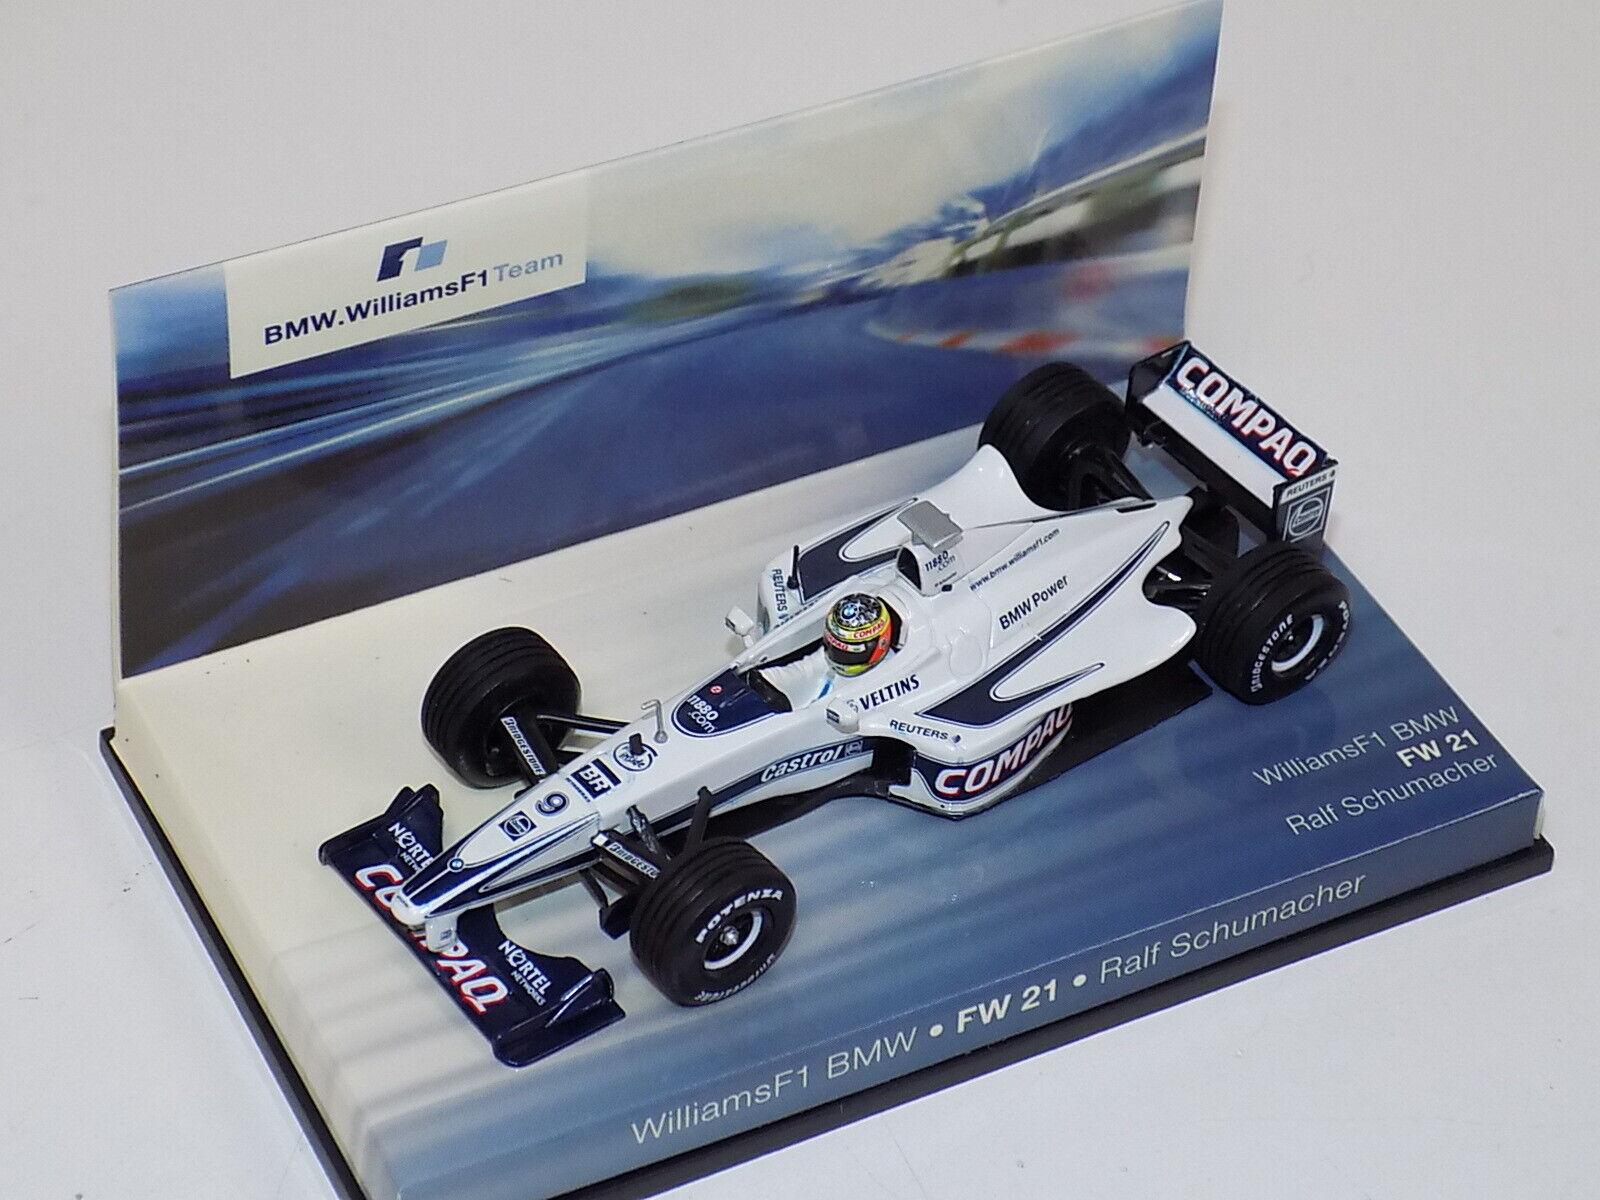 1 43 Minichamps F1 Williams BMW FW21 Ralf Schumacher BMW edition